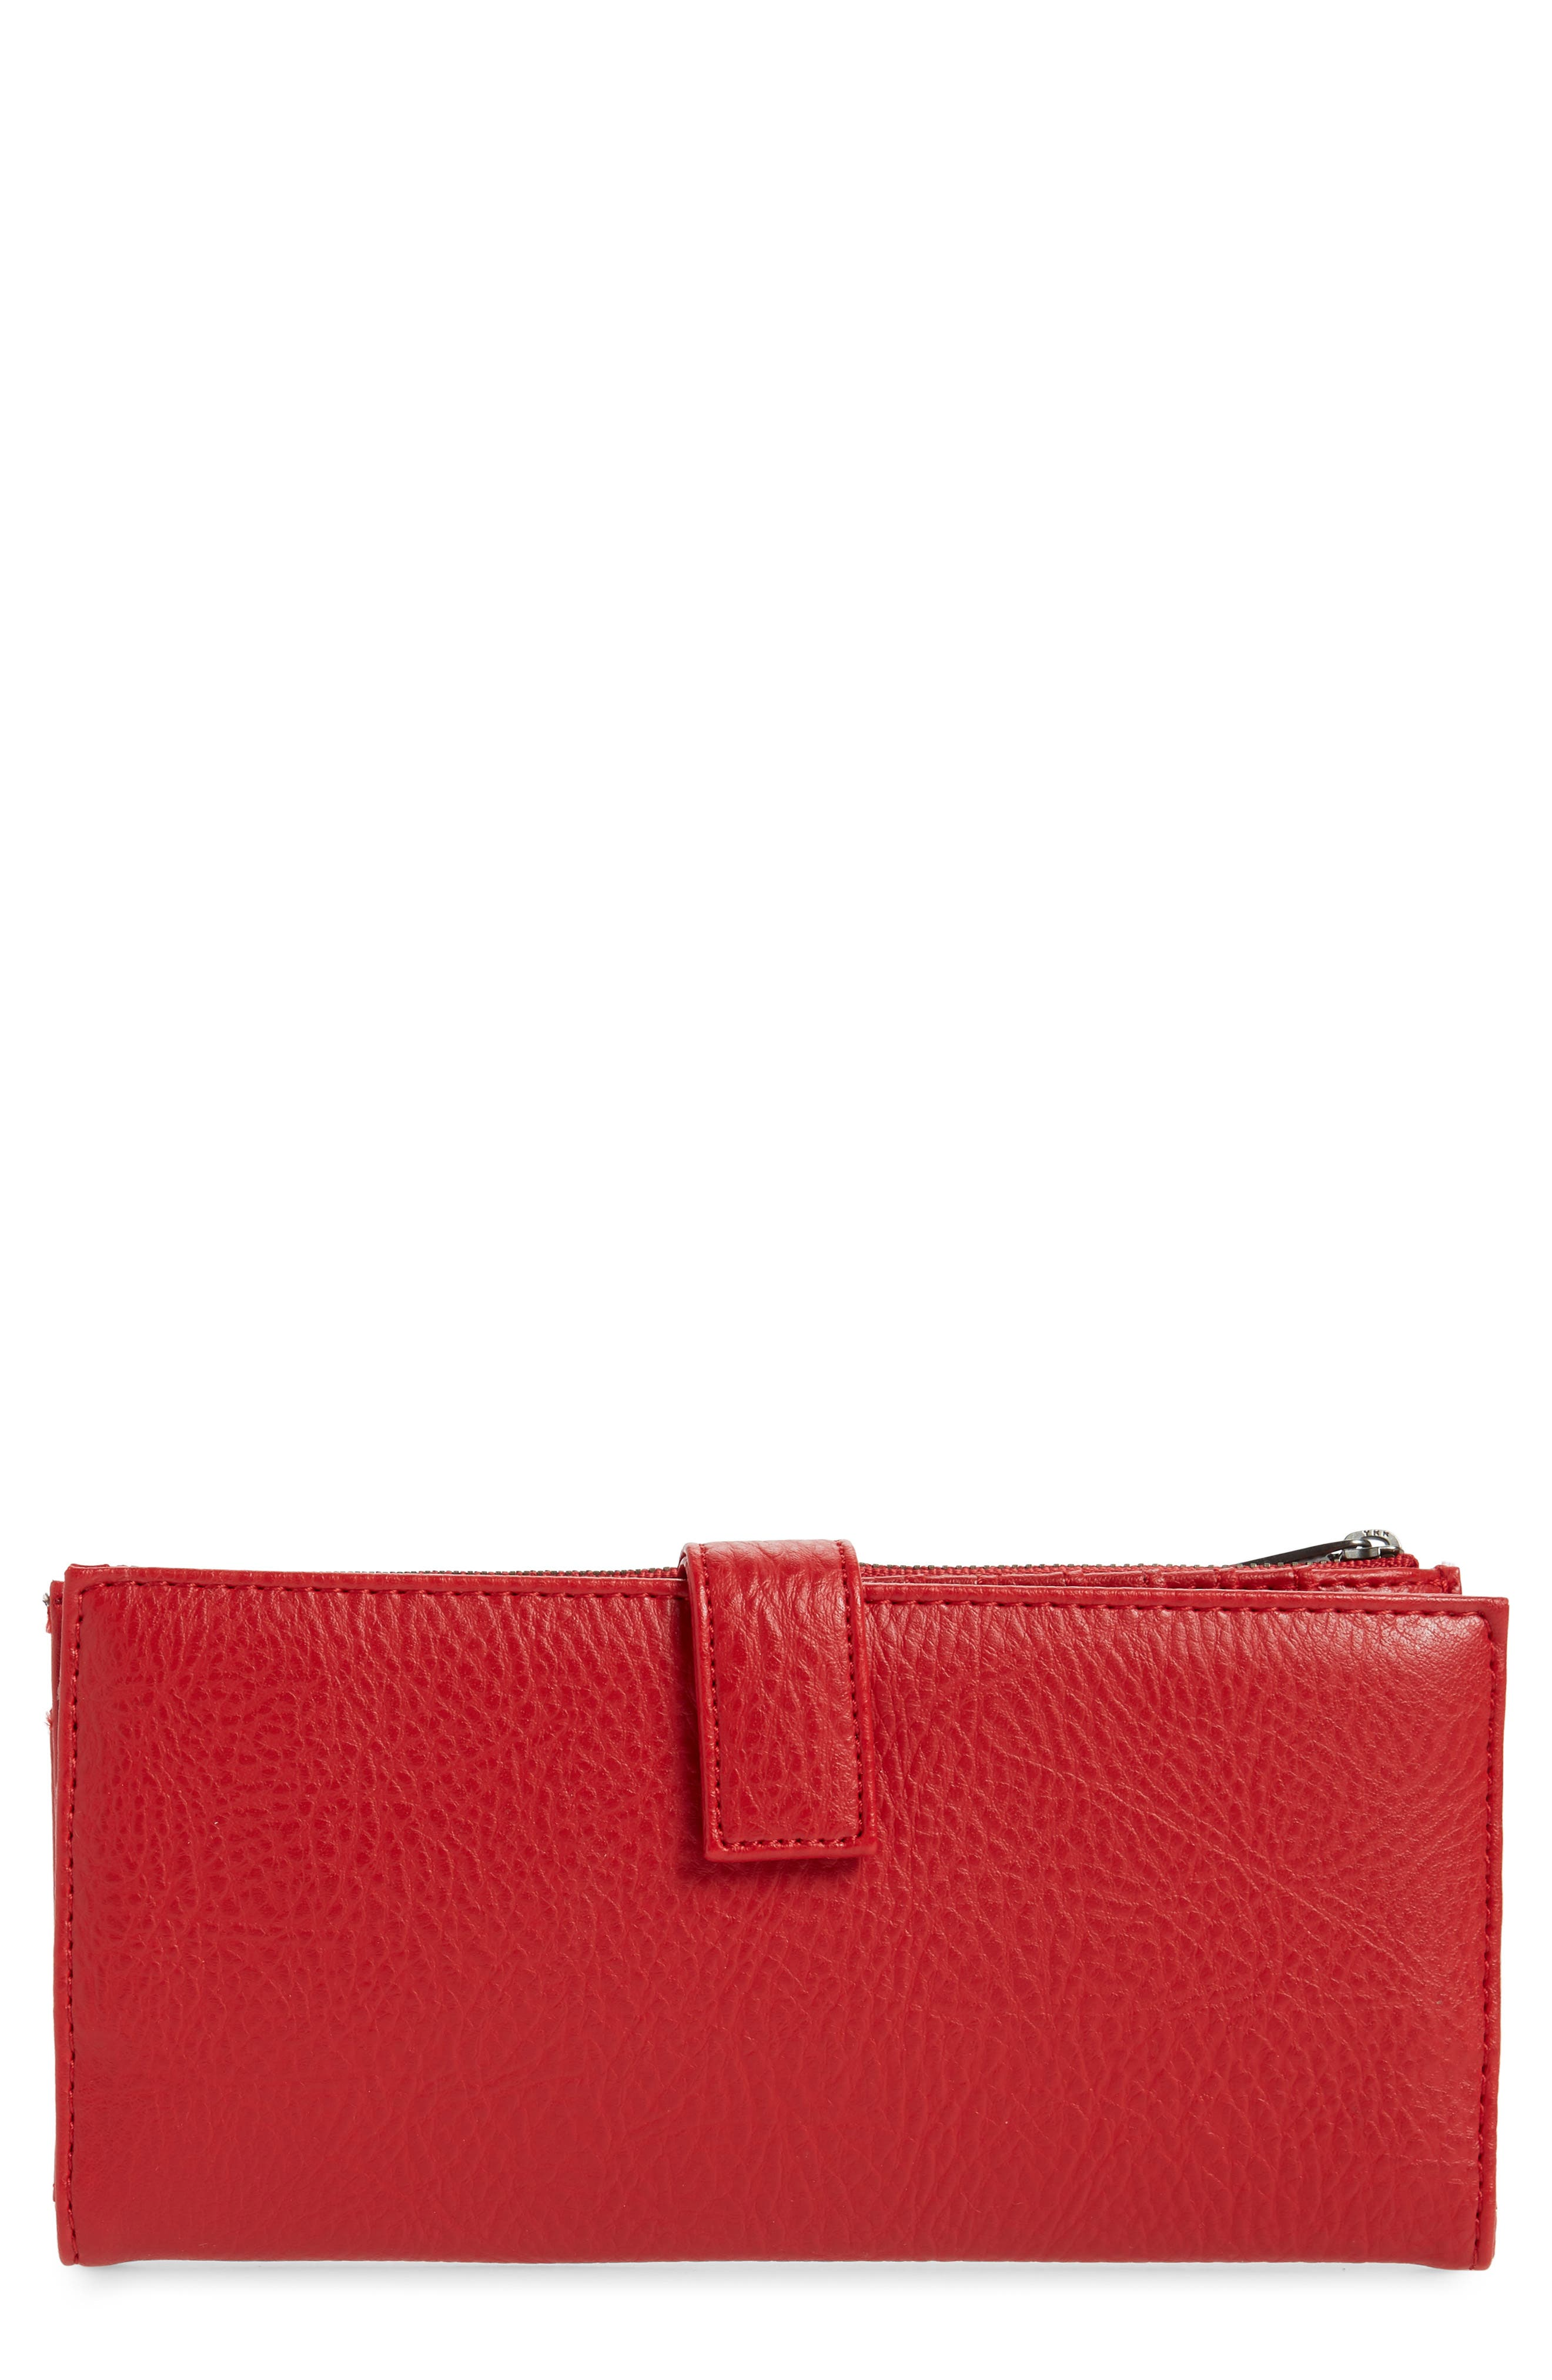 Matt & Nat Motiv Faux Leather Continental Wallet - Red